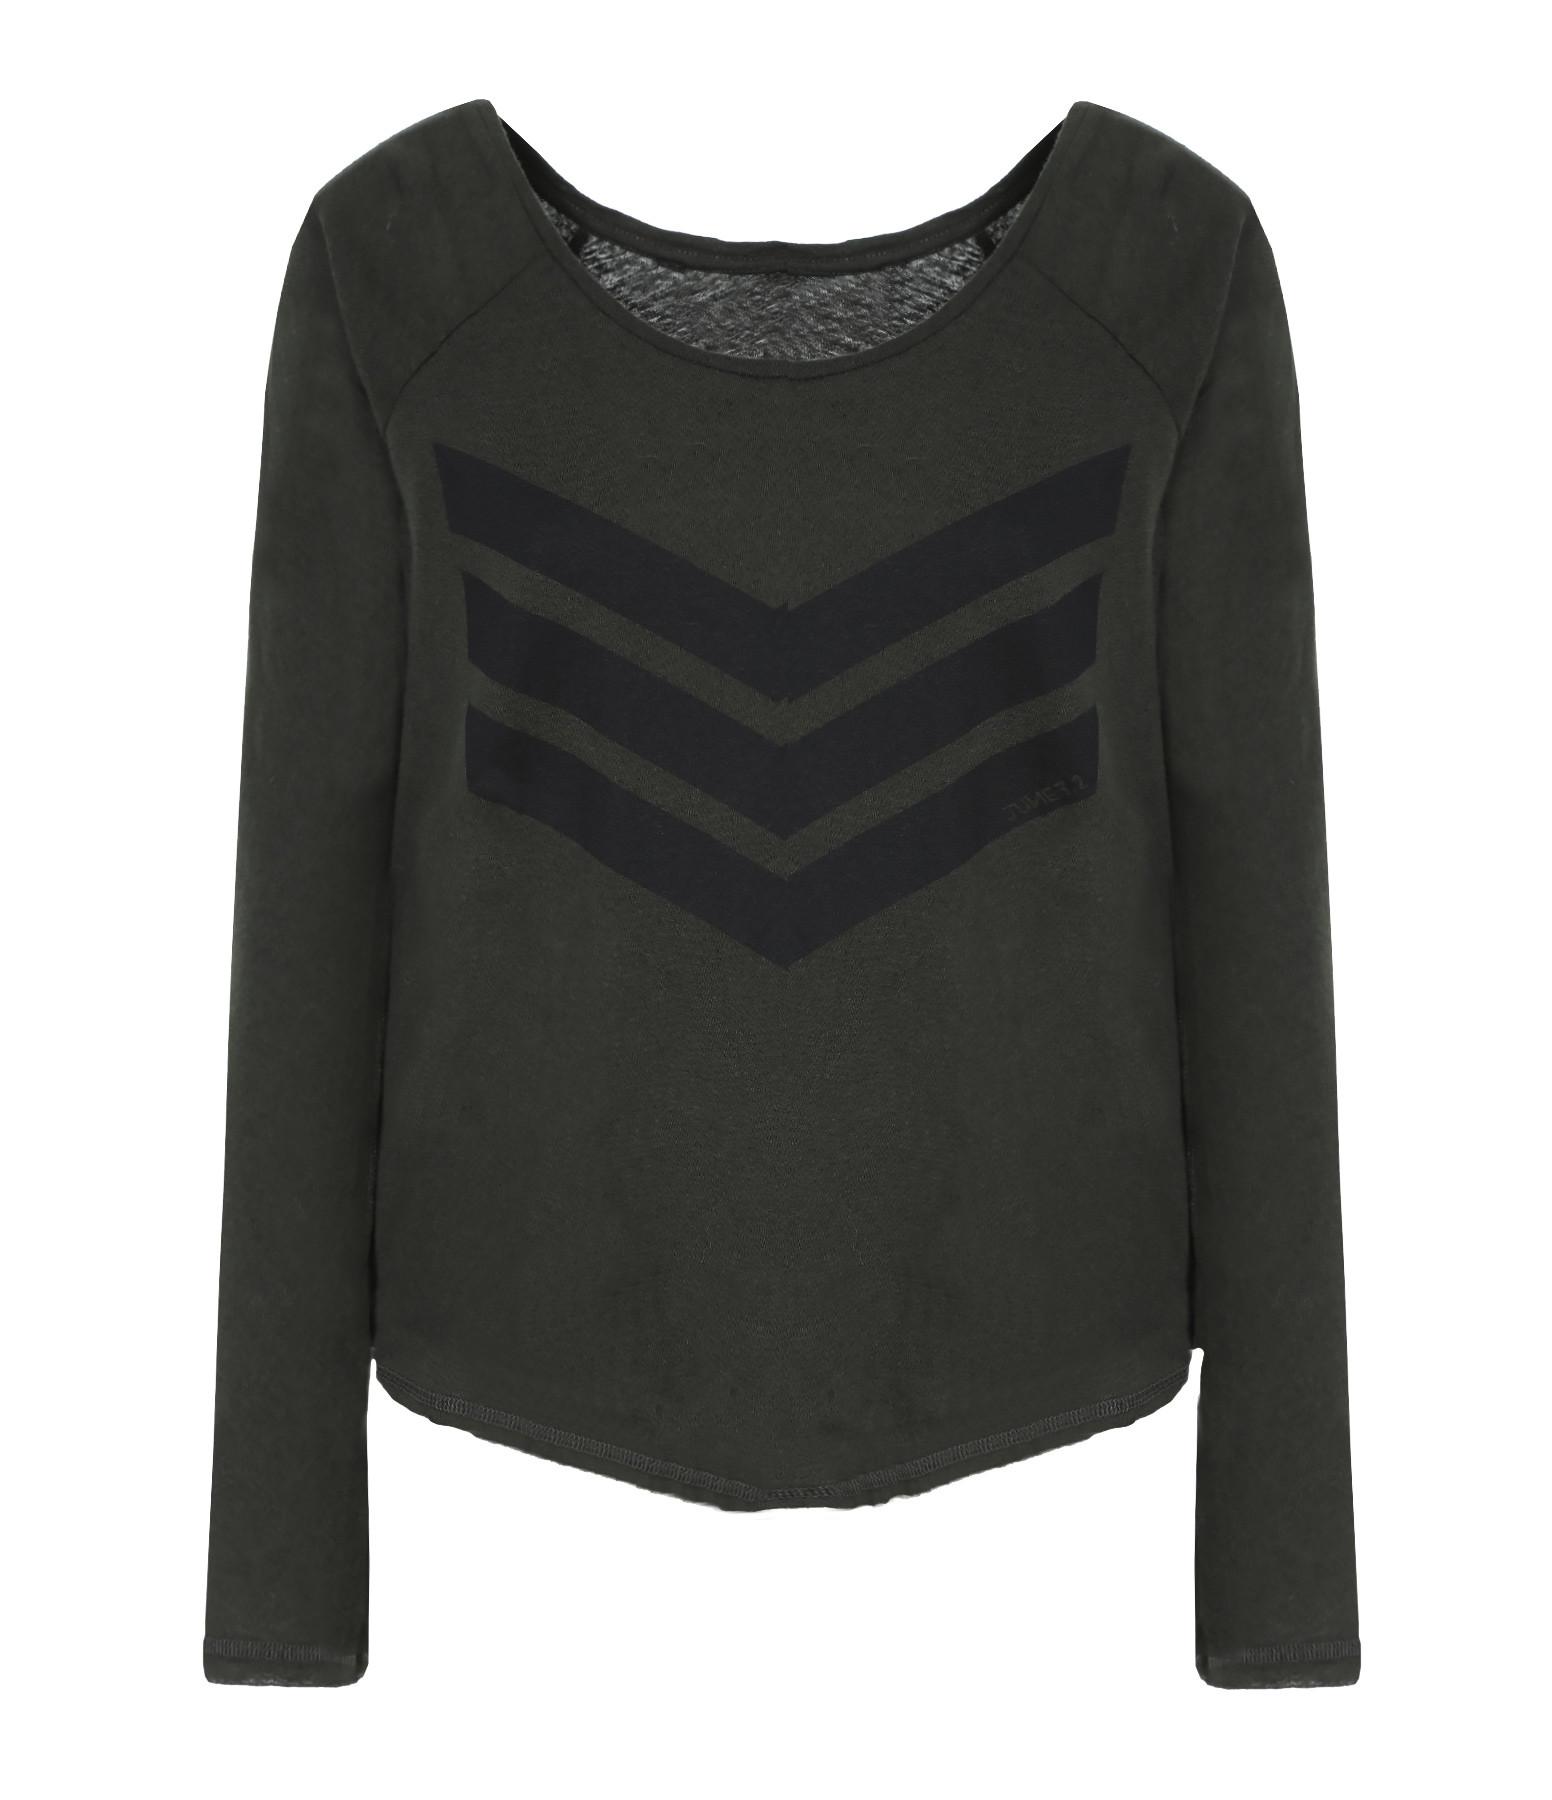 JUNE 7.2 - Tee-shirt Yann Coton Lin Kaki Logo Noir